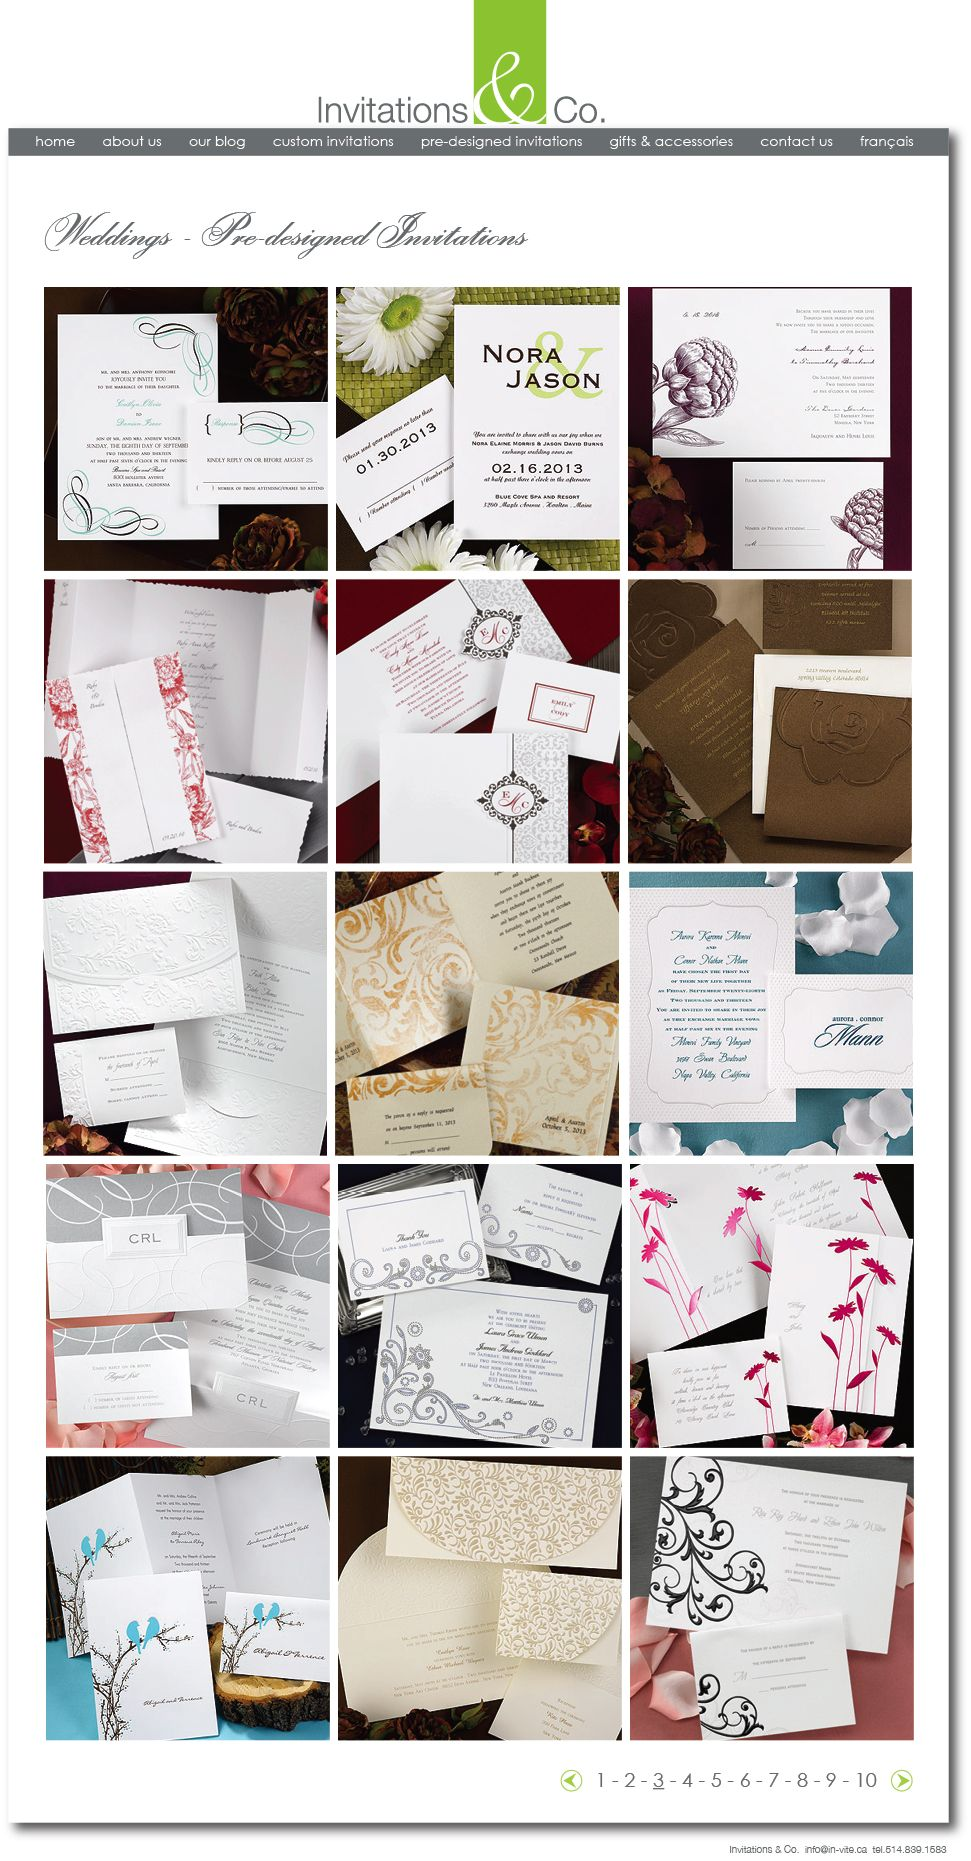 Invitations & Co. Wedding Invitations